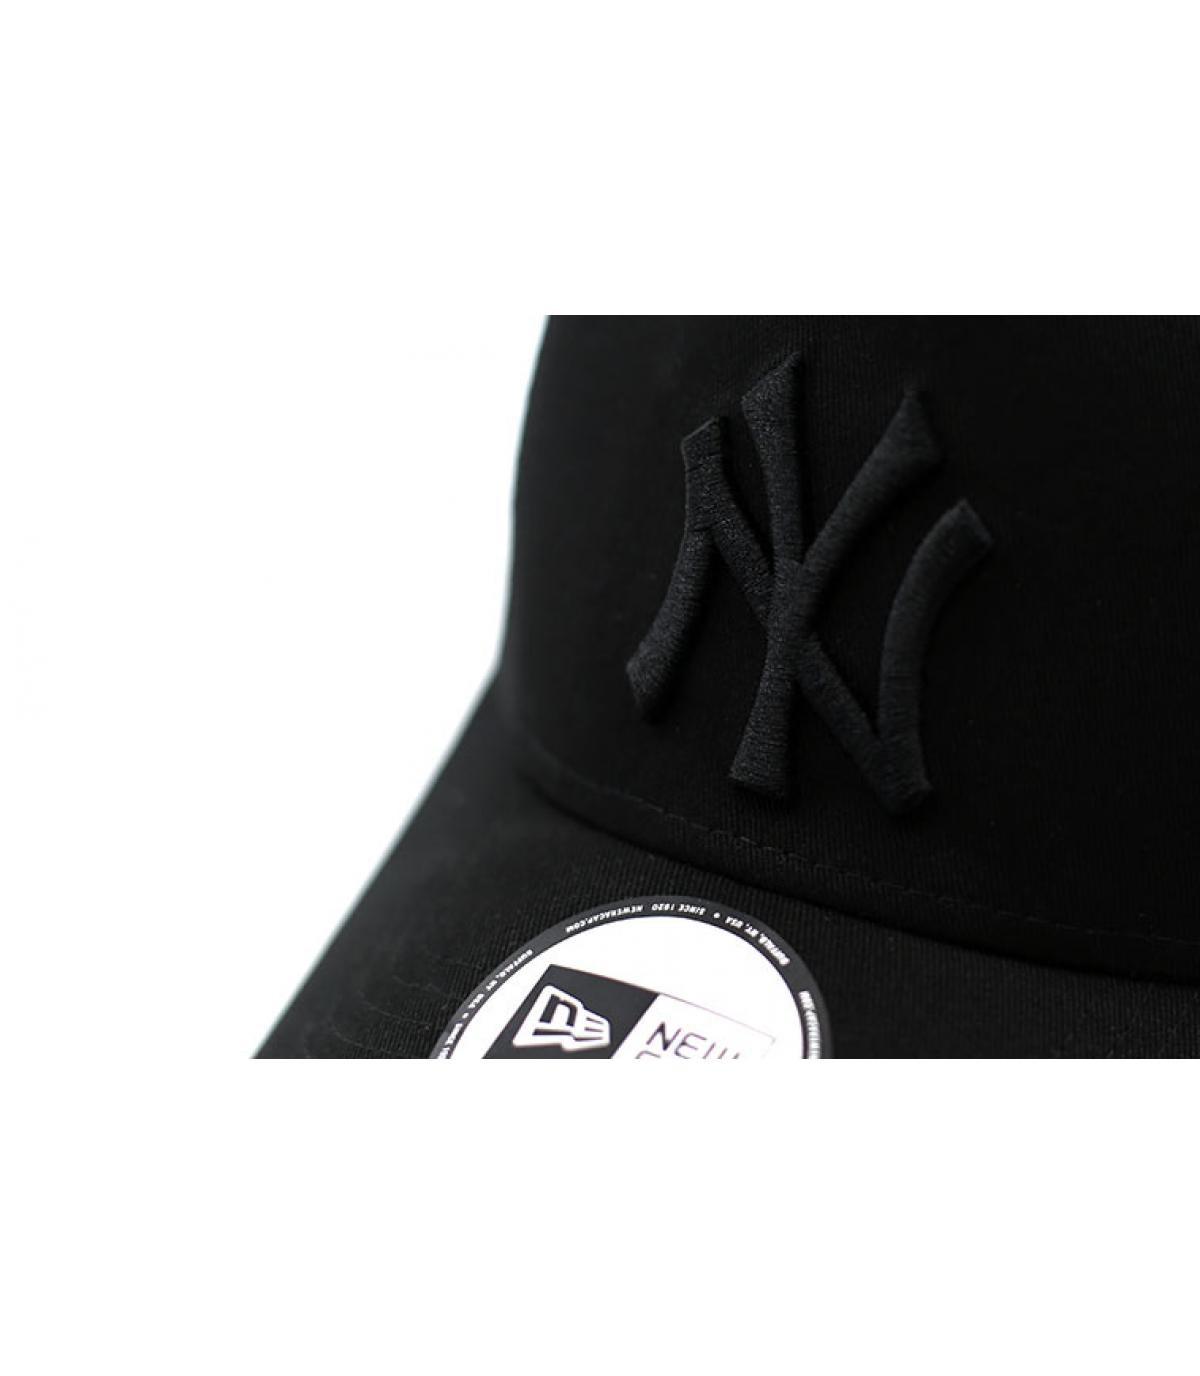 Dettagli Trucker League Ess NY black black - image 3